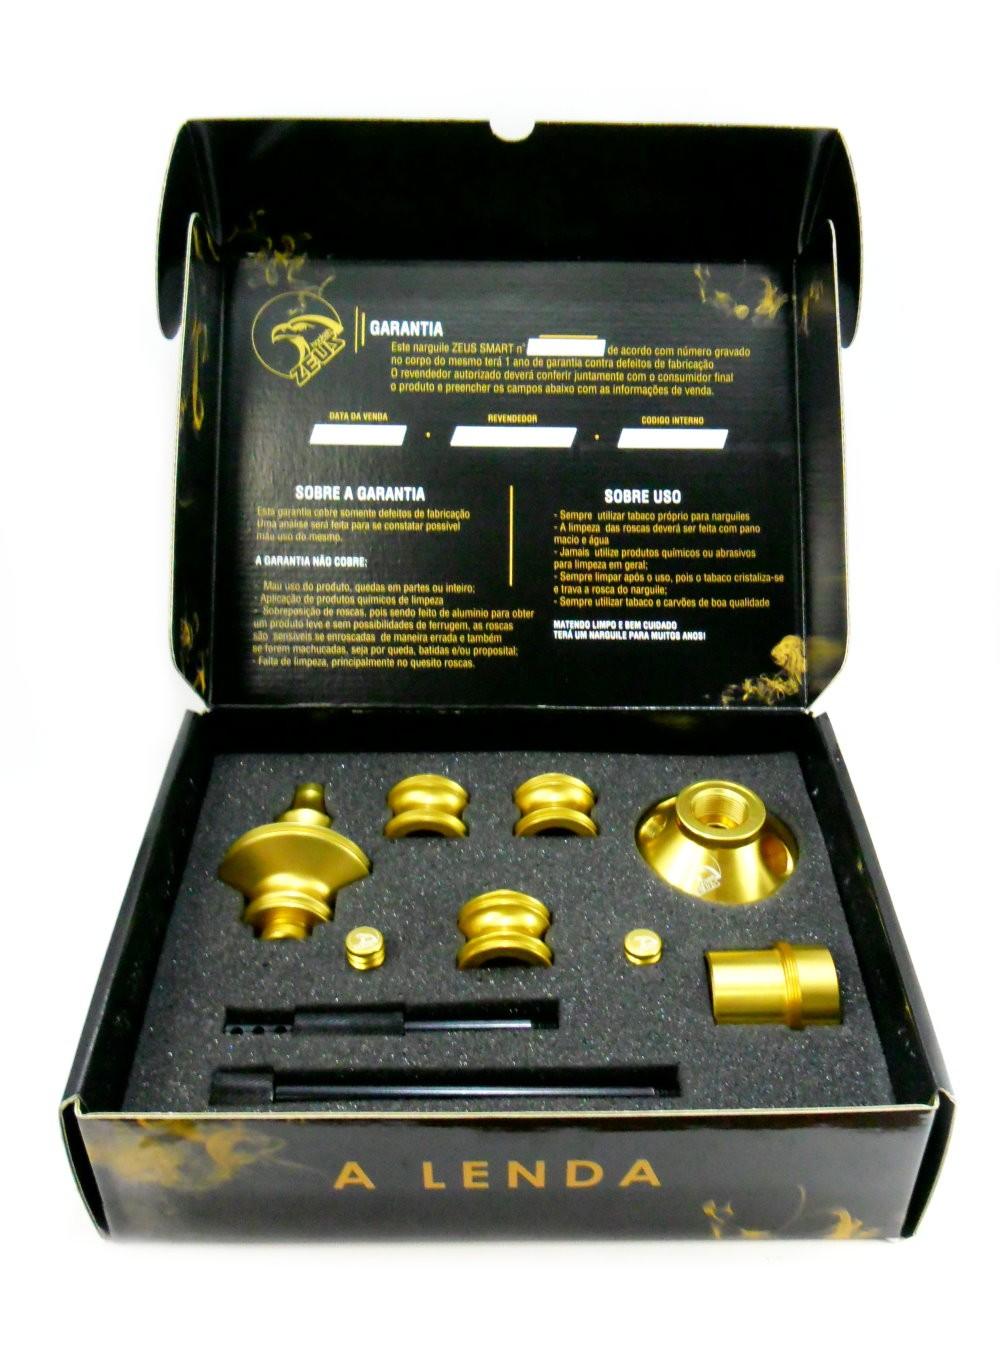 Stem (corpo de narguile) Zeus Híbrido Smart - cor Dourado